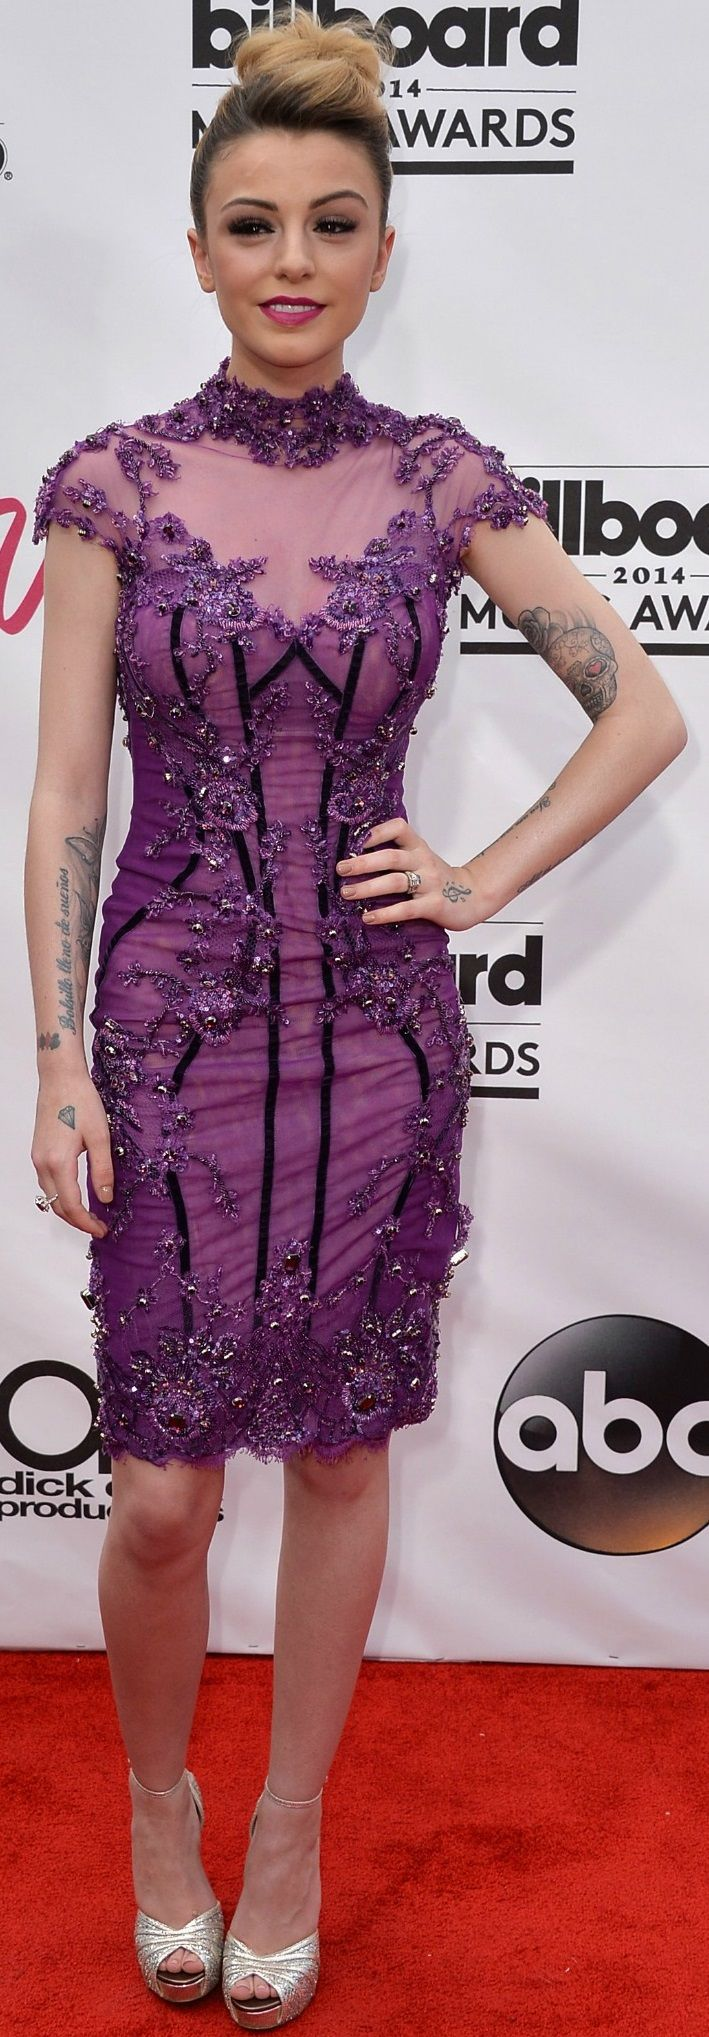 Cher Lloyd at the Billboard Music Awards 2014